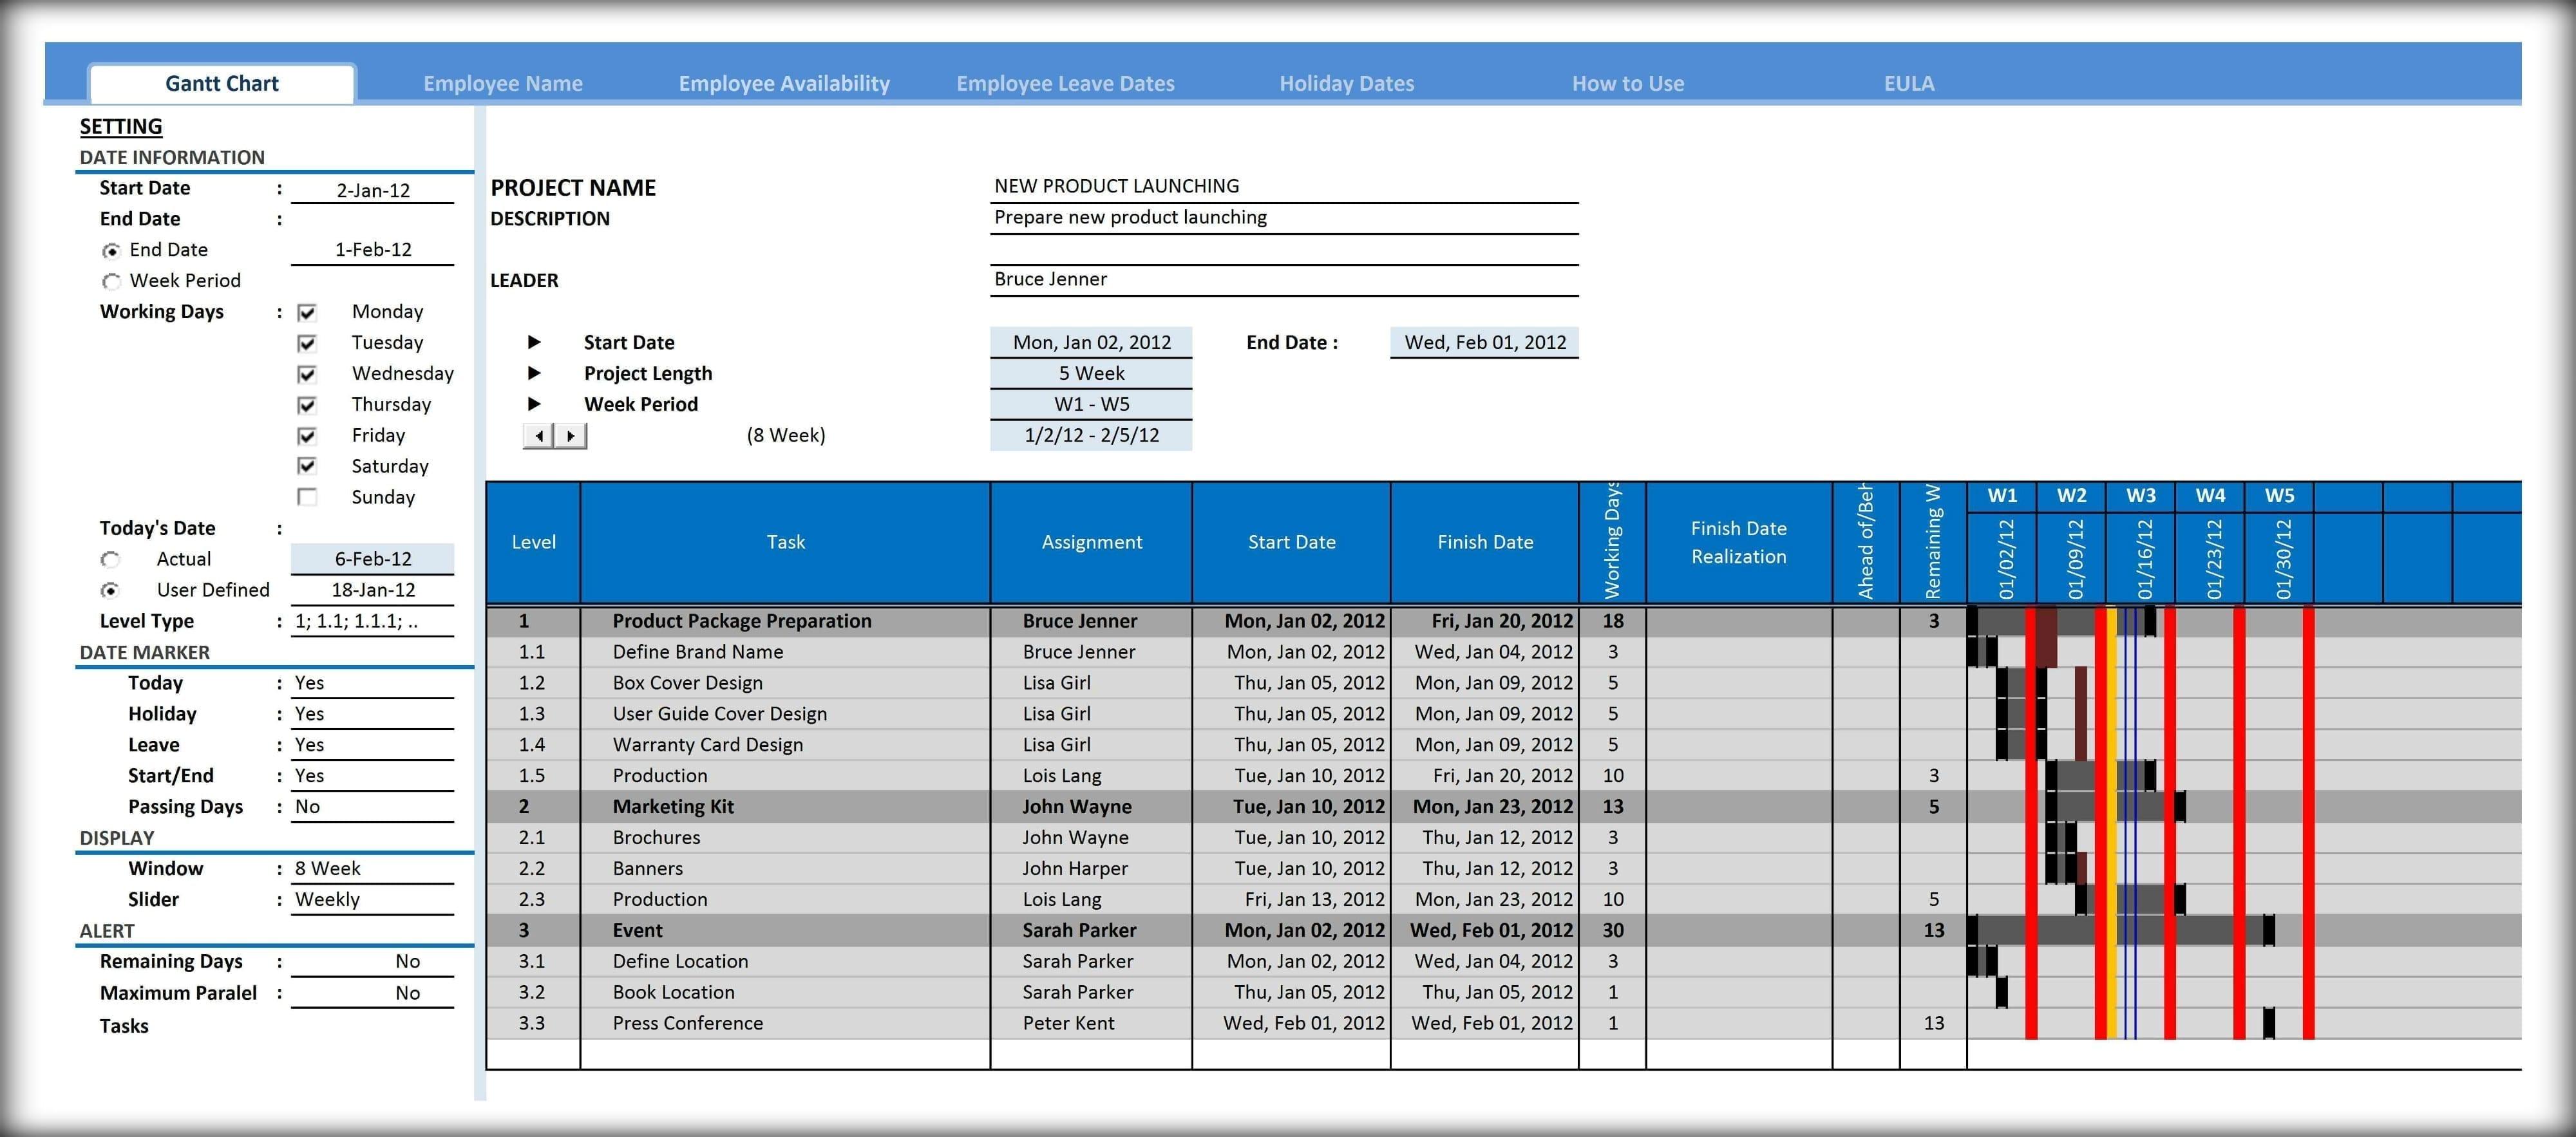 Excel 2010 Gantt Chart Template Excel Spreadsheet Gantt Chart Template Spreadsheet Templates for Busines Spreadsheet Templates for Busines Project Management Gantt Chart Excel